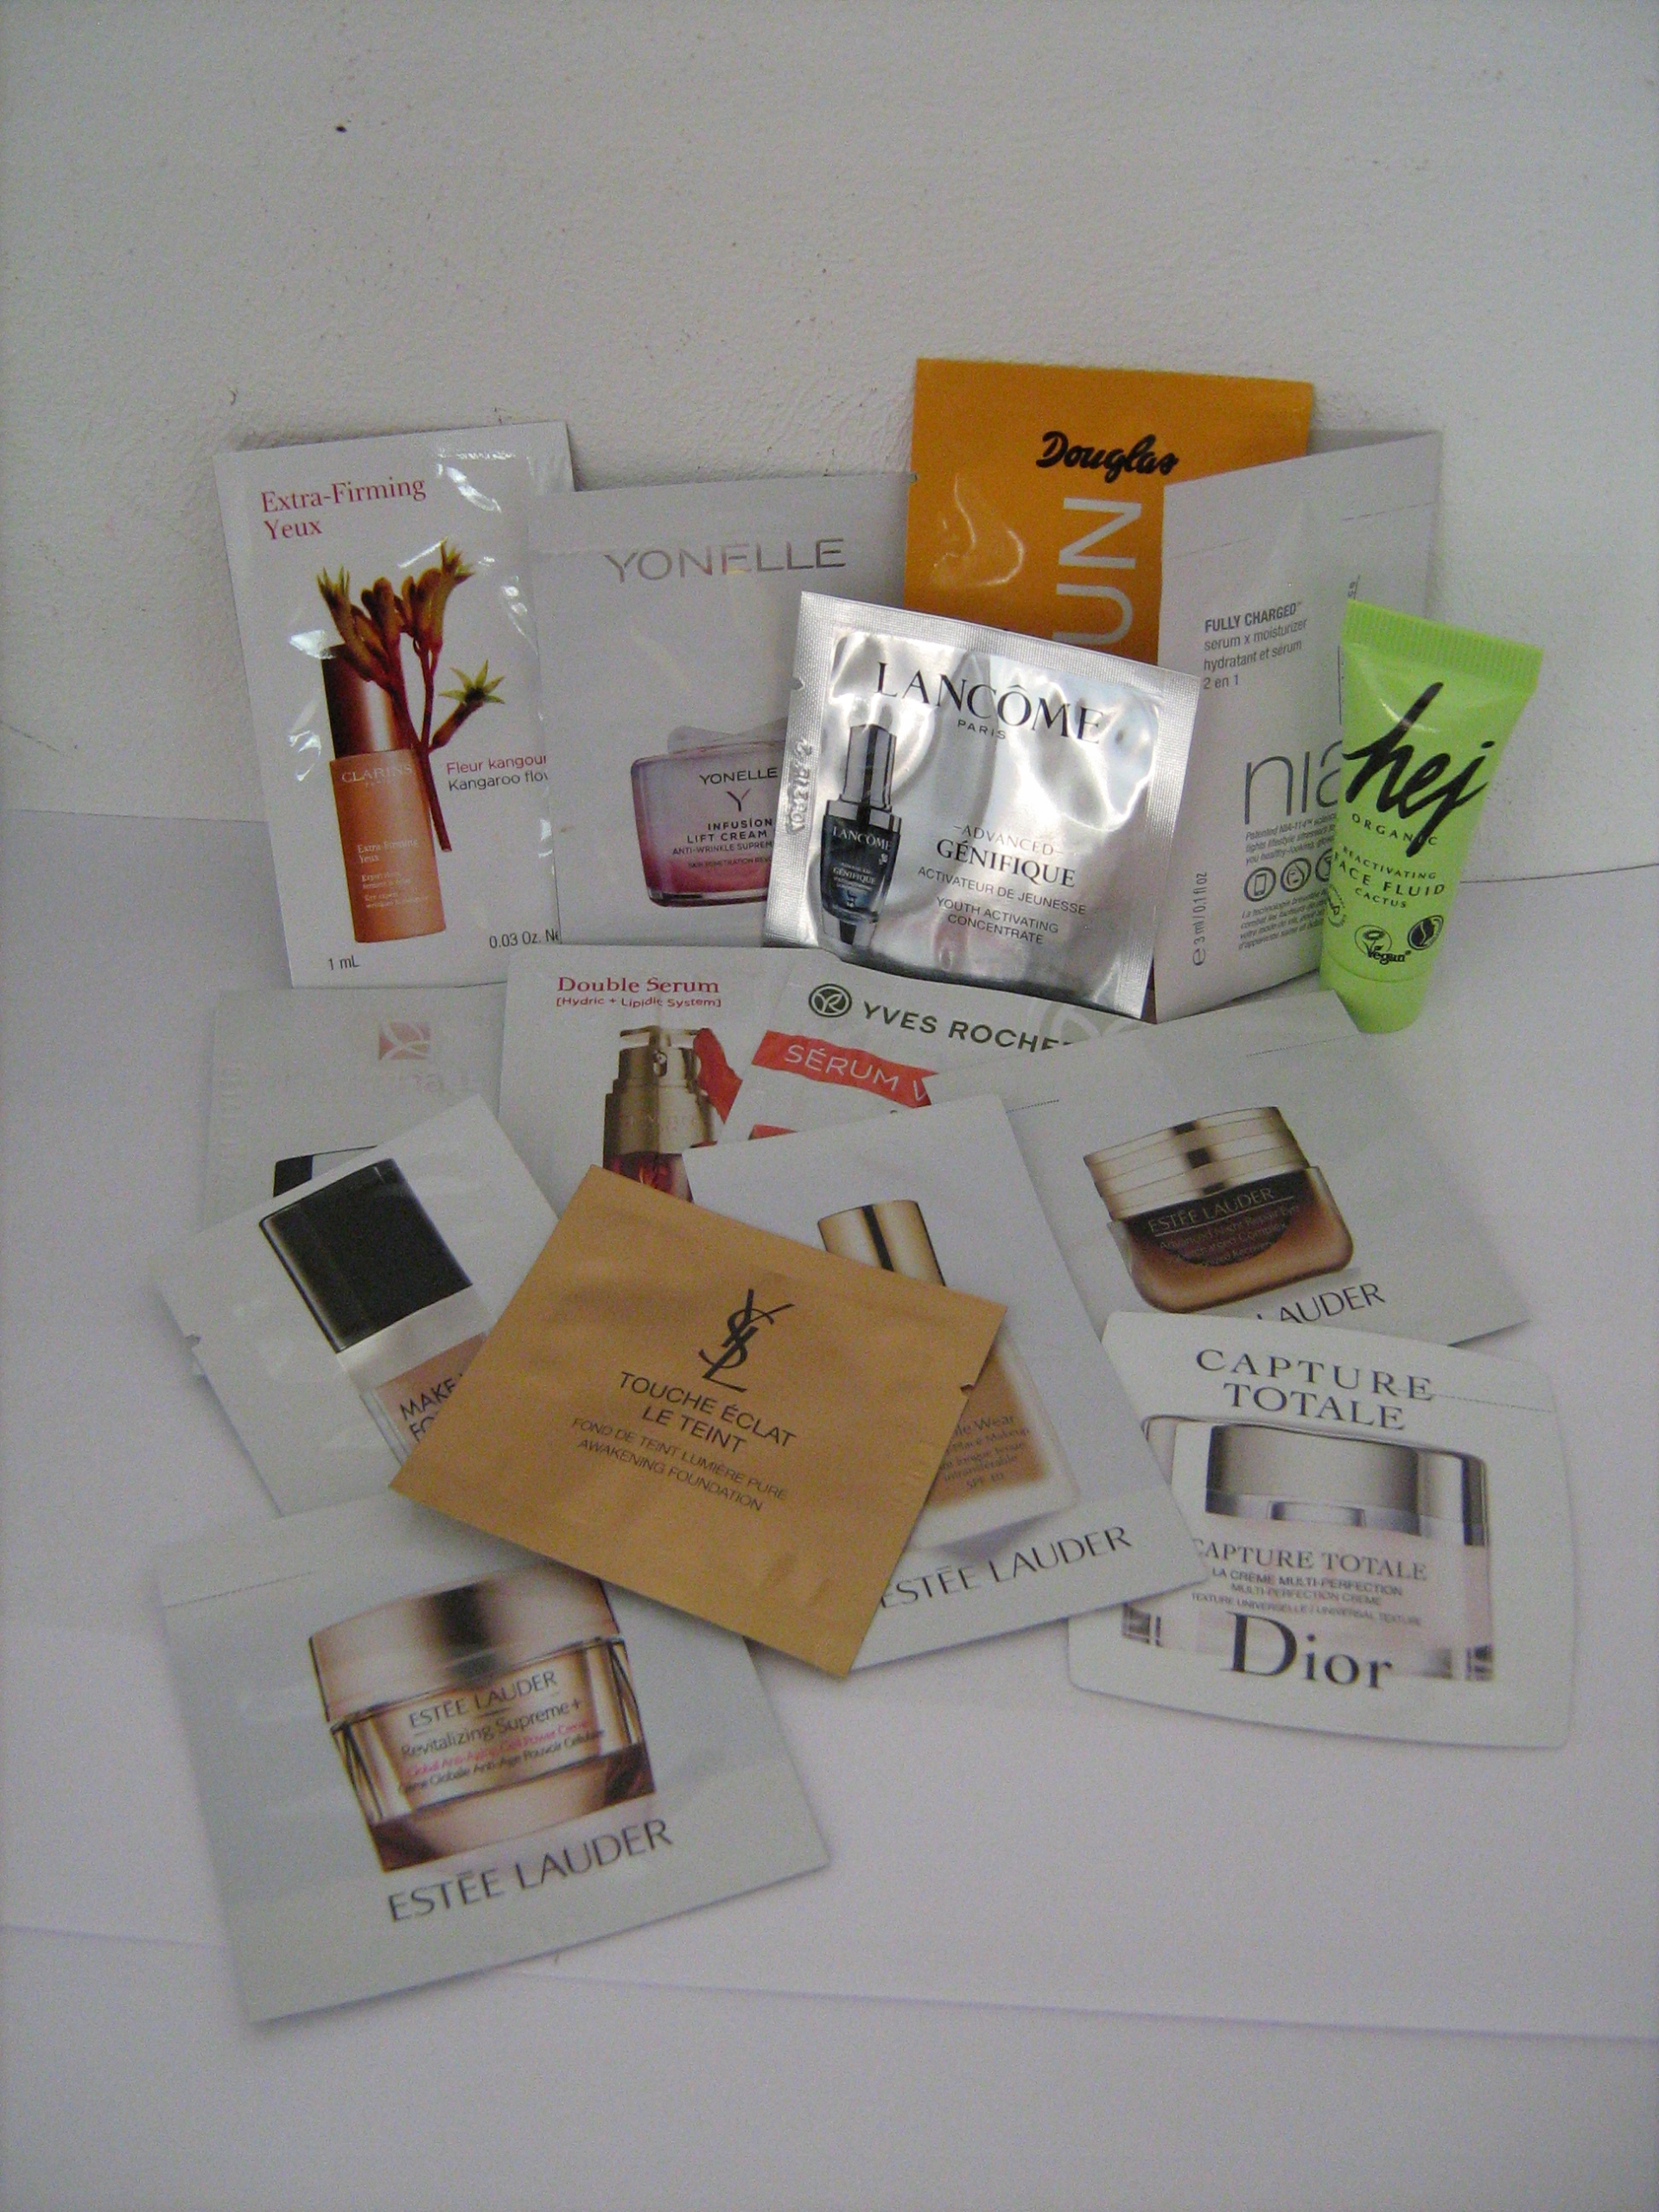 Próbki Dior Lancome Lauder YSL Clarins Eris 15 szt